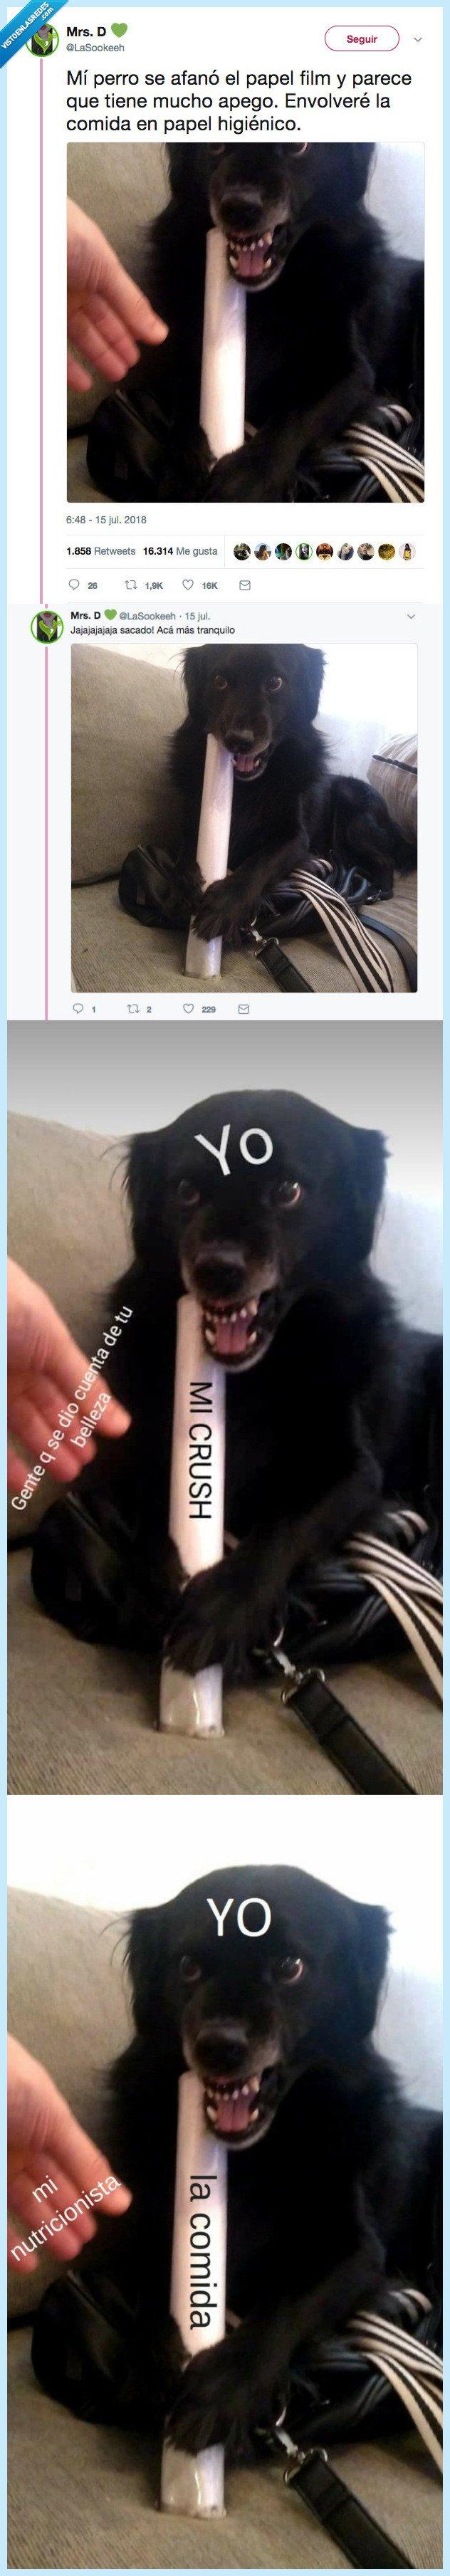 meme,moda,perro